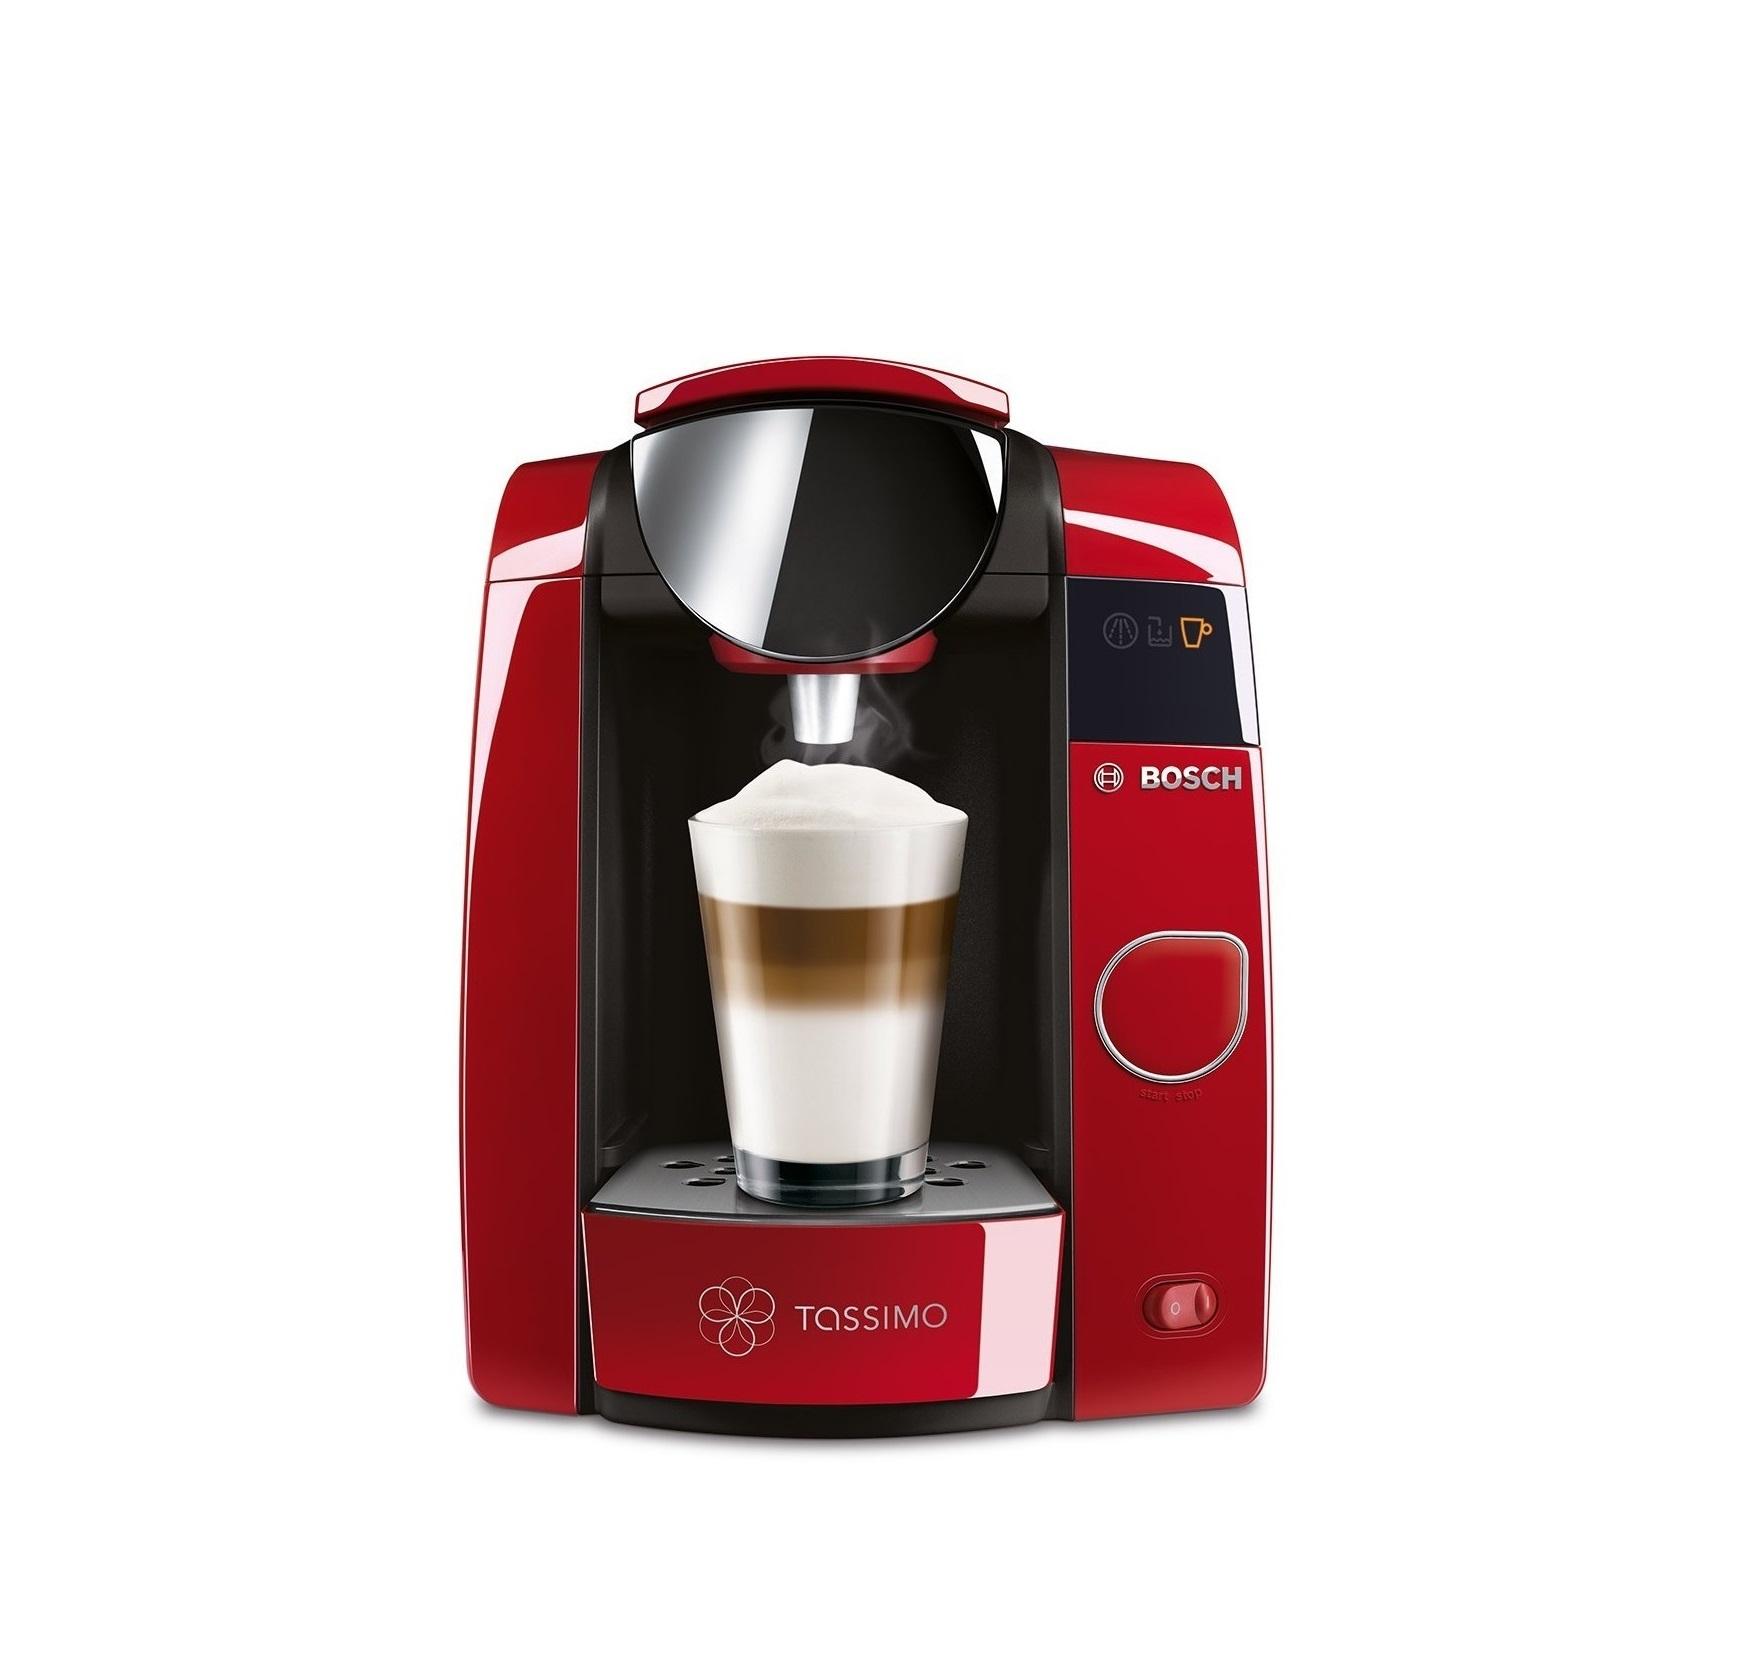 bosch tassimo joy 2 t45 red multi drinks pod machine. Black Bedroom Furniture Sets. Home Design Ideas